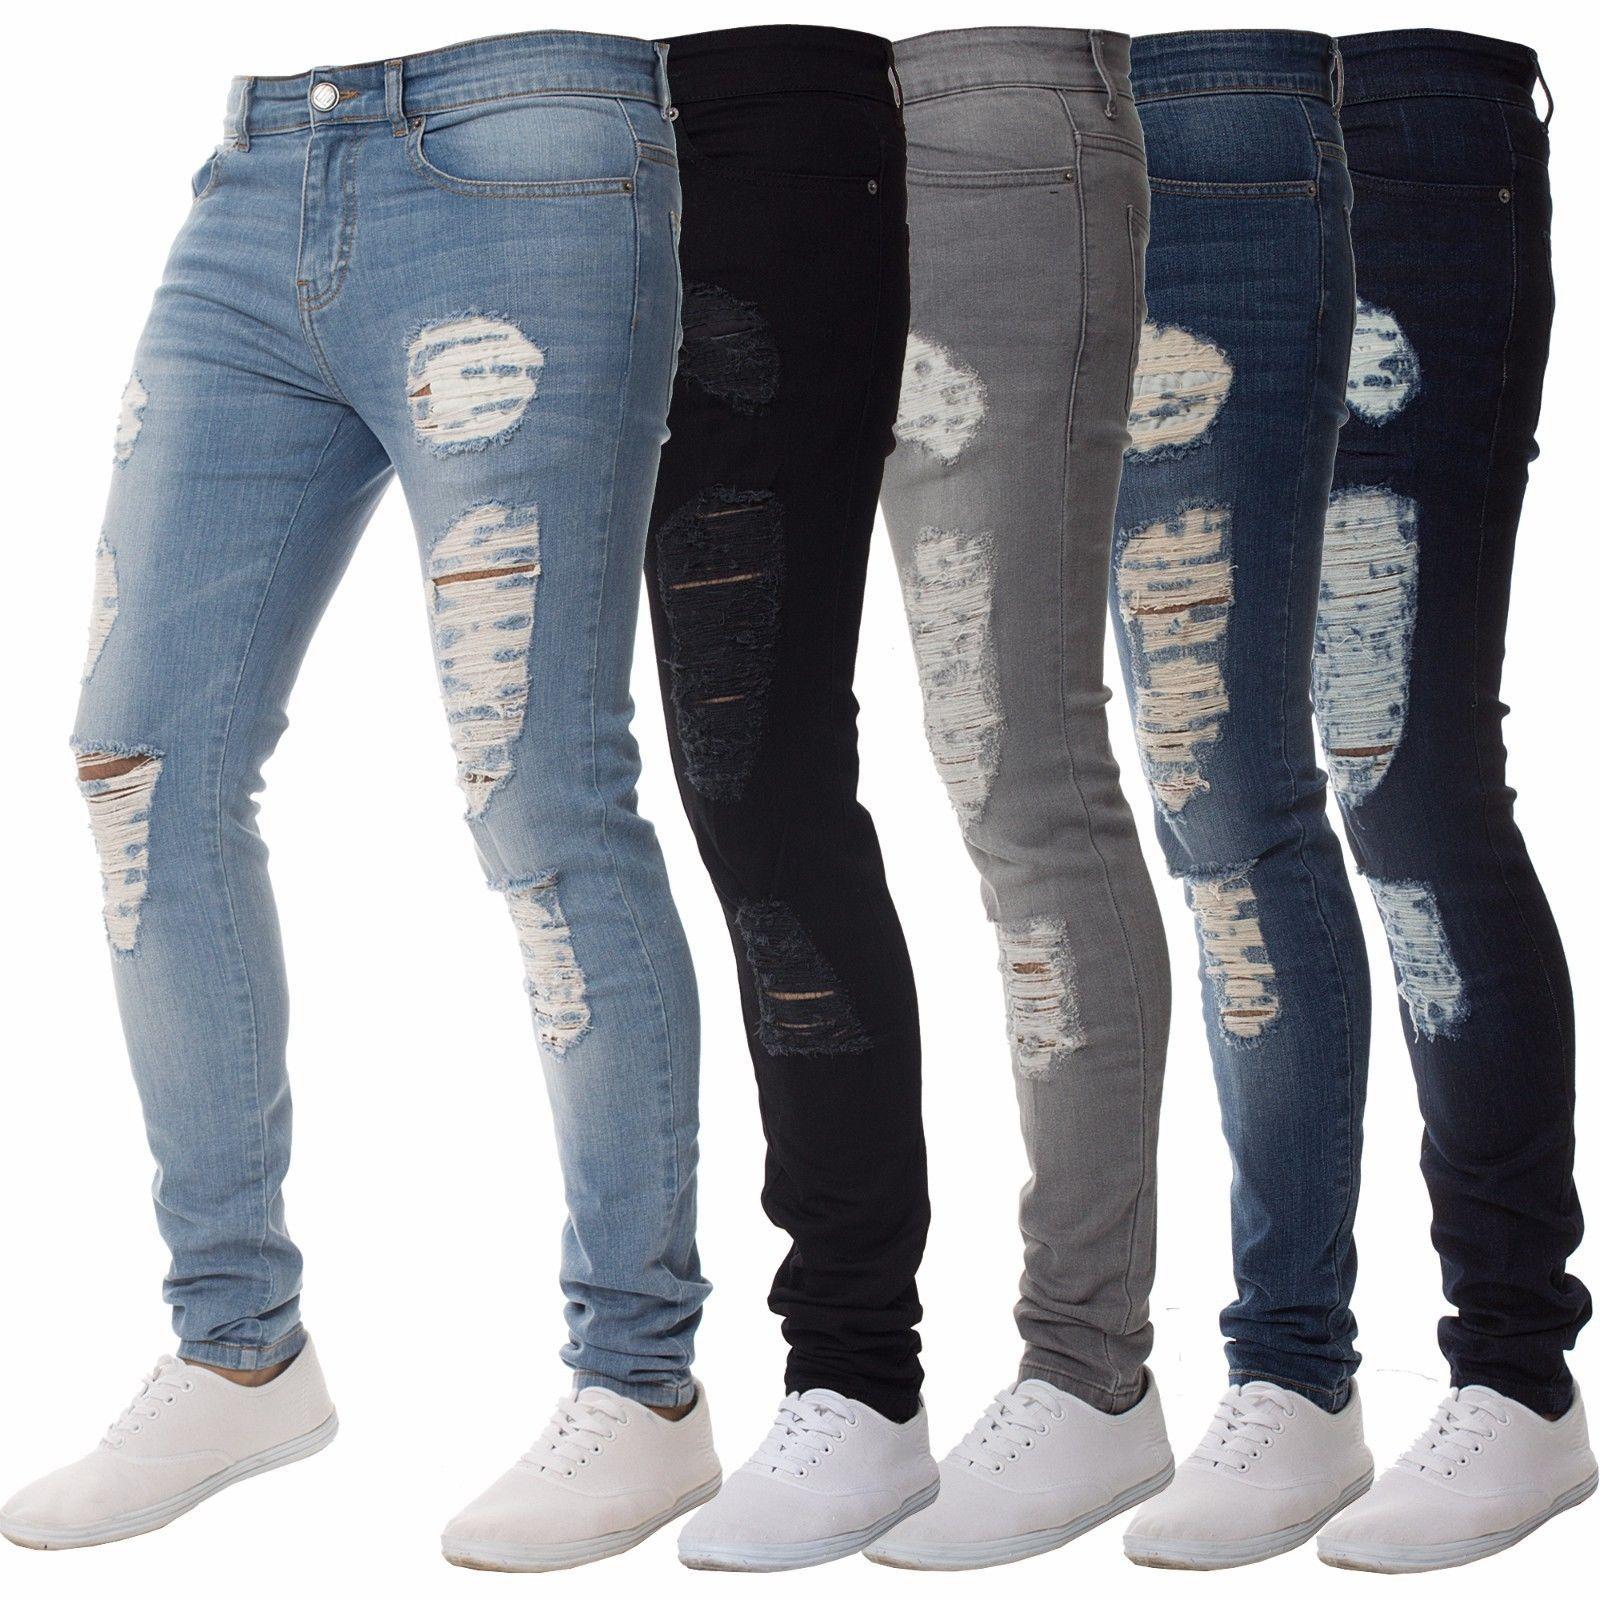 New Style Jeans Men Autumn Slim Fit With Holes Long Pants Youth Trend Elasticity Men's Versatile Skinny Pants